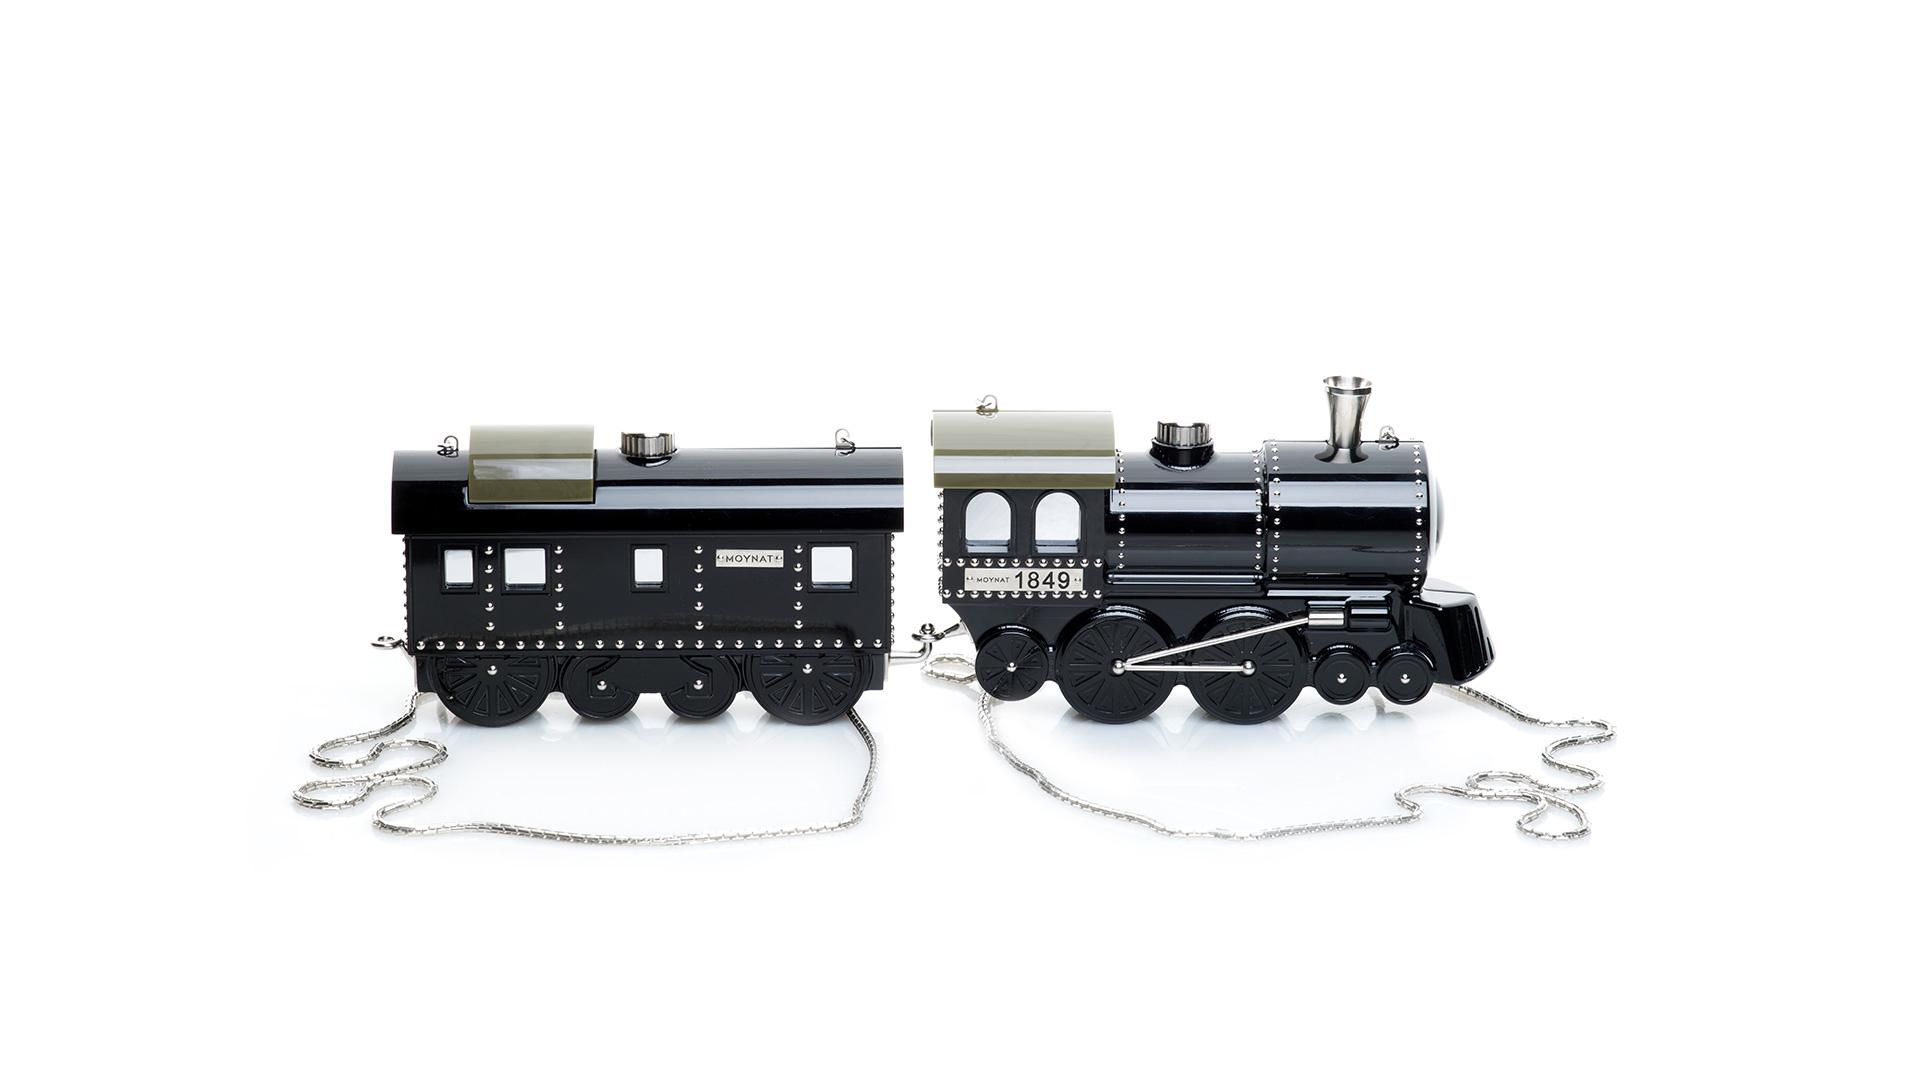 moynat-paris-train-bag-pharrell-williams.jpg